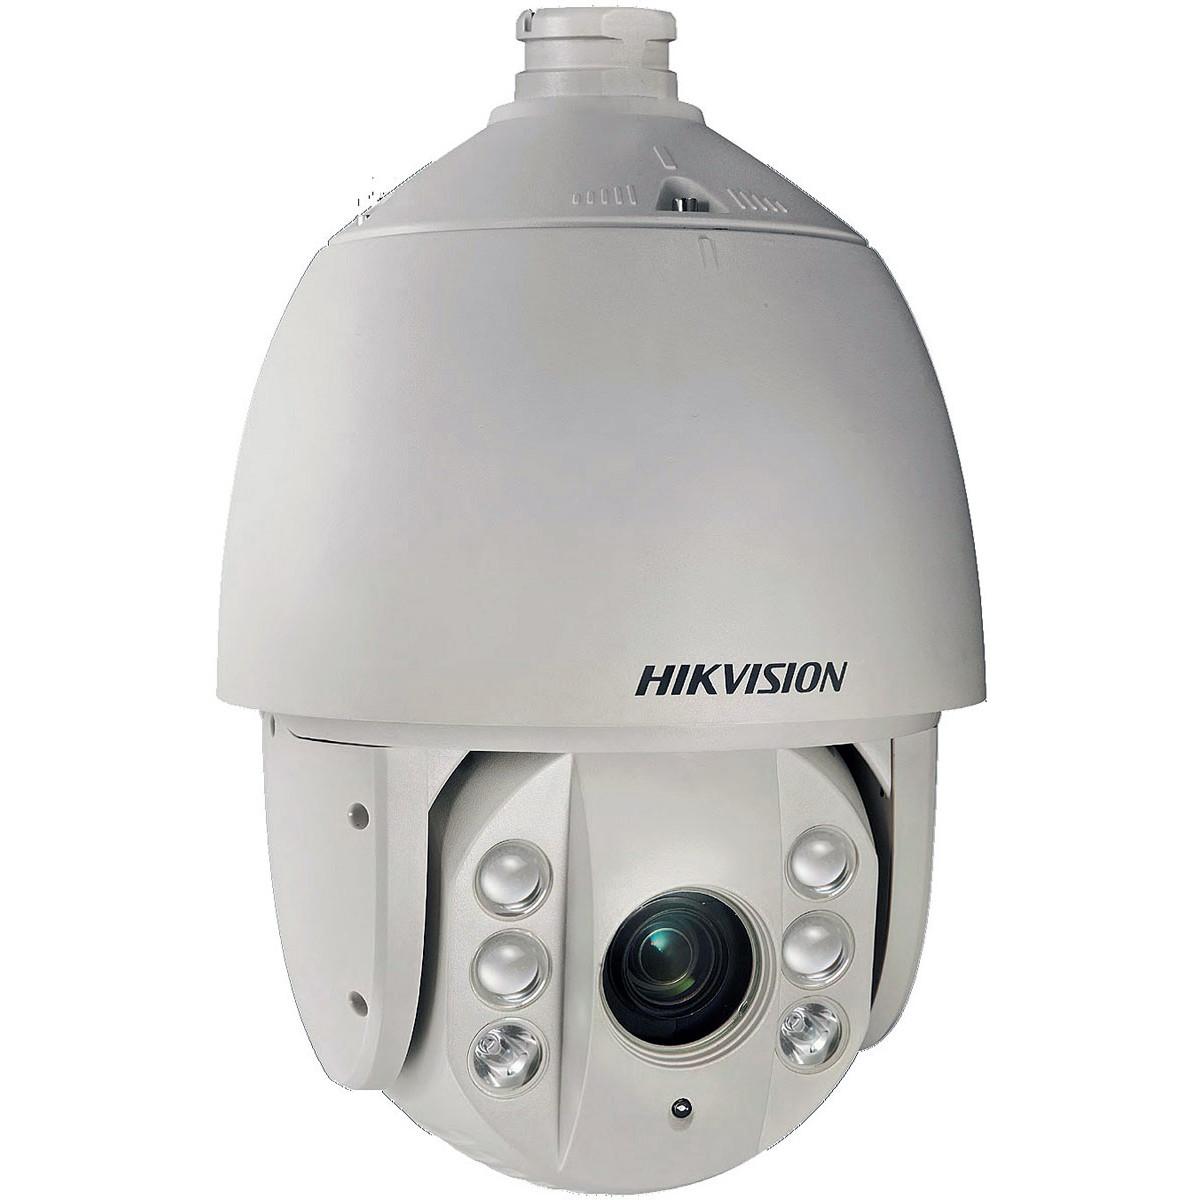 Hikvision DS-2AE7123TI-A + кронштейн на стену HD Скоростная поворотная камера